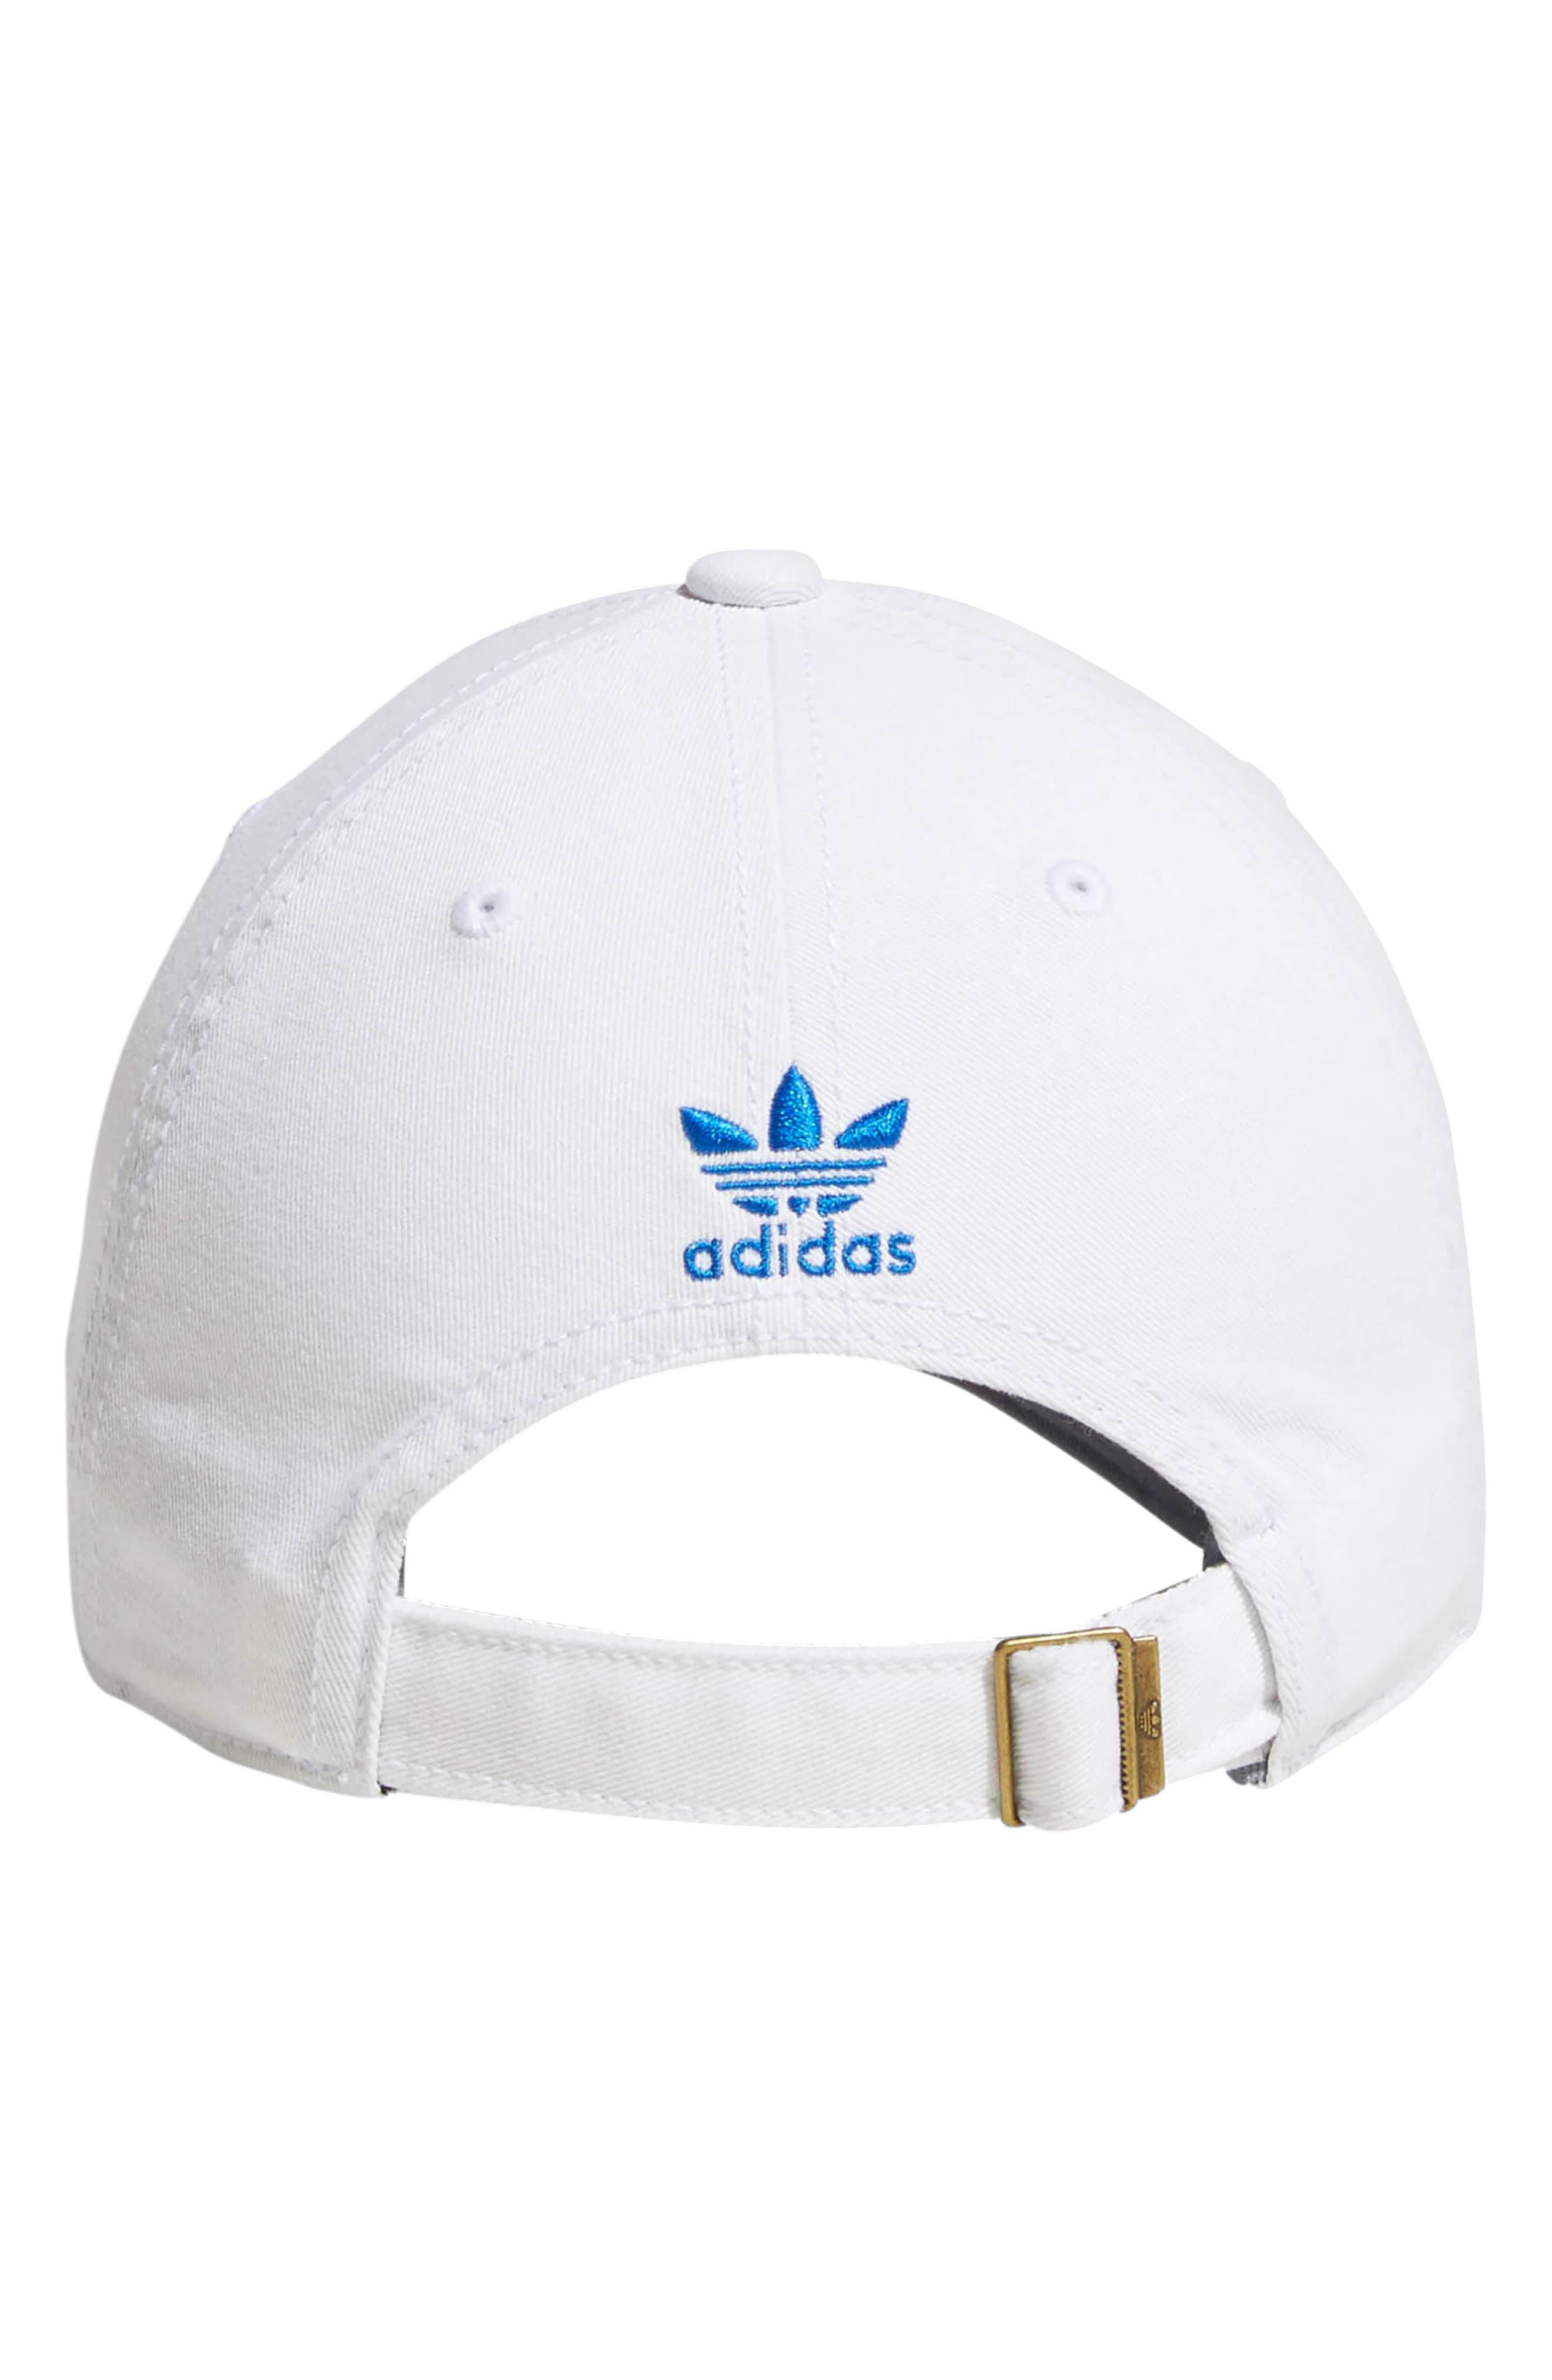 Relaxed Strap-Back Cap,                             Alternate thumbnail 3, color,                             White/ Bluebird